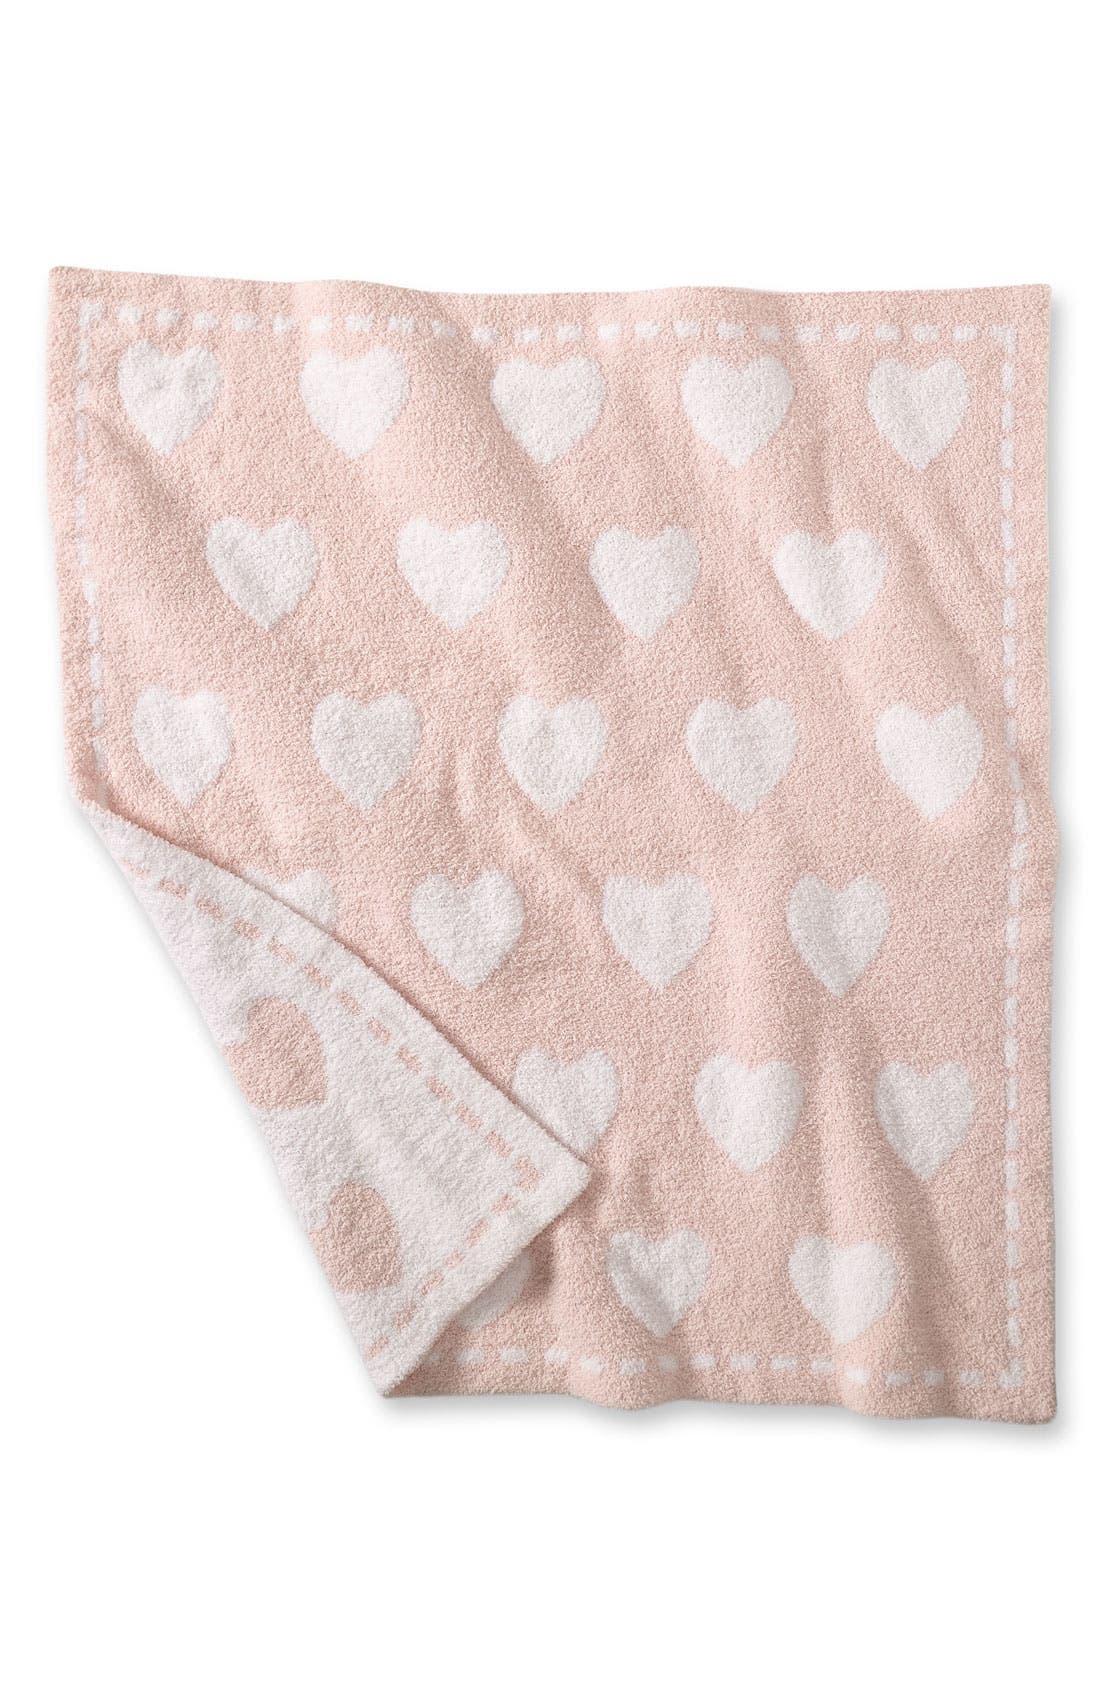 Main Image - Barefoot Dreams® Receiving Blanket